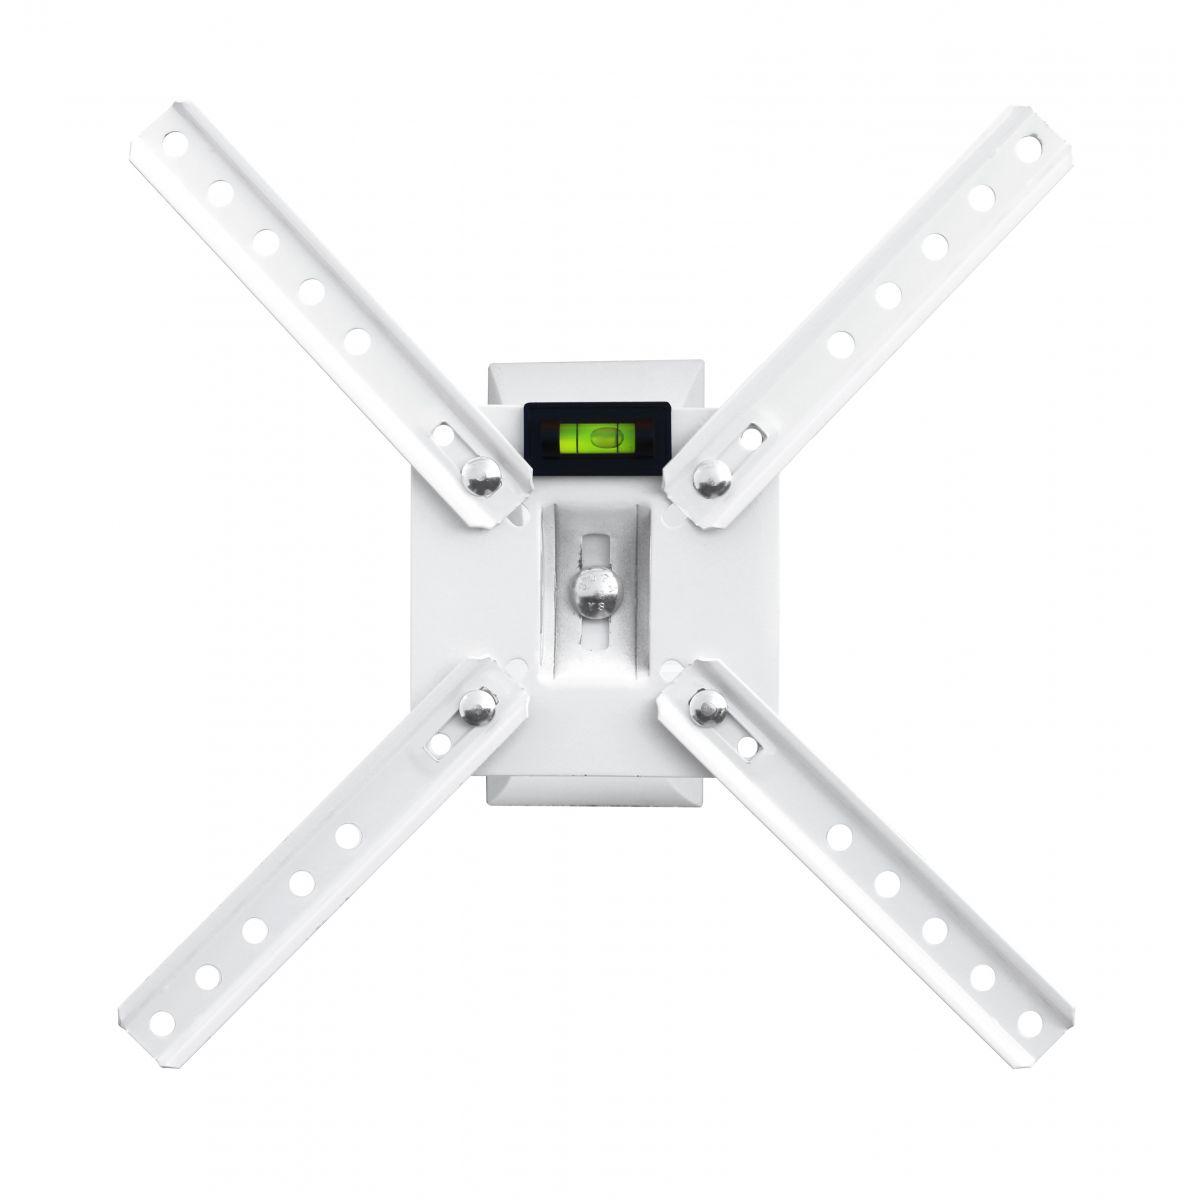 Suporte de parede Brasforma Articulado (3 movimentos) para TV LCD, LED, PLASMA de 10´ a 42´ SBRLB130 Branco